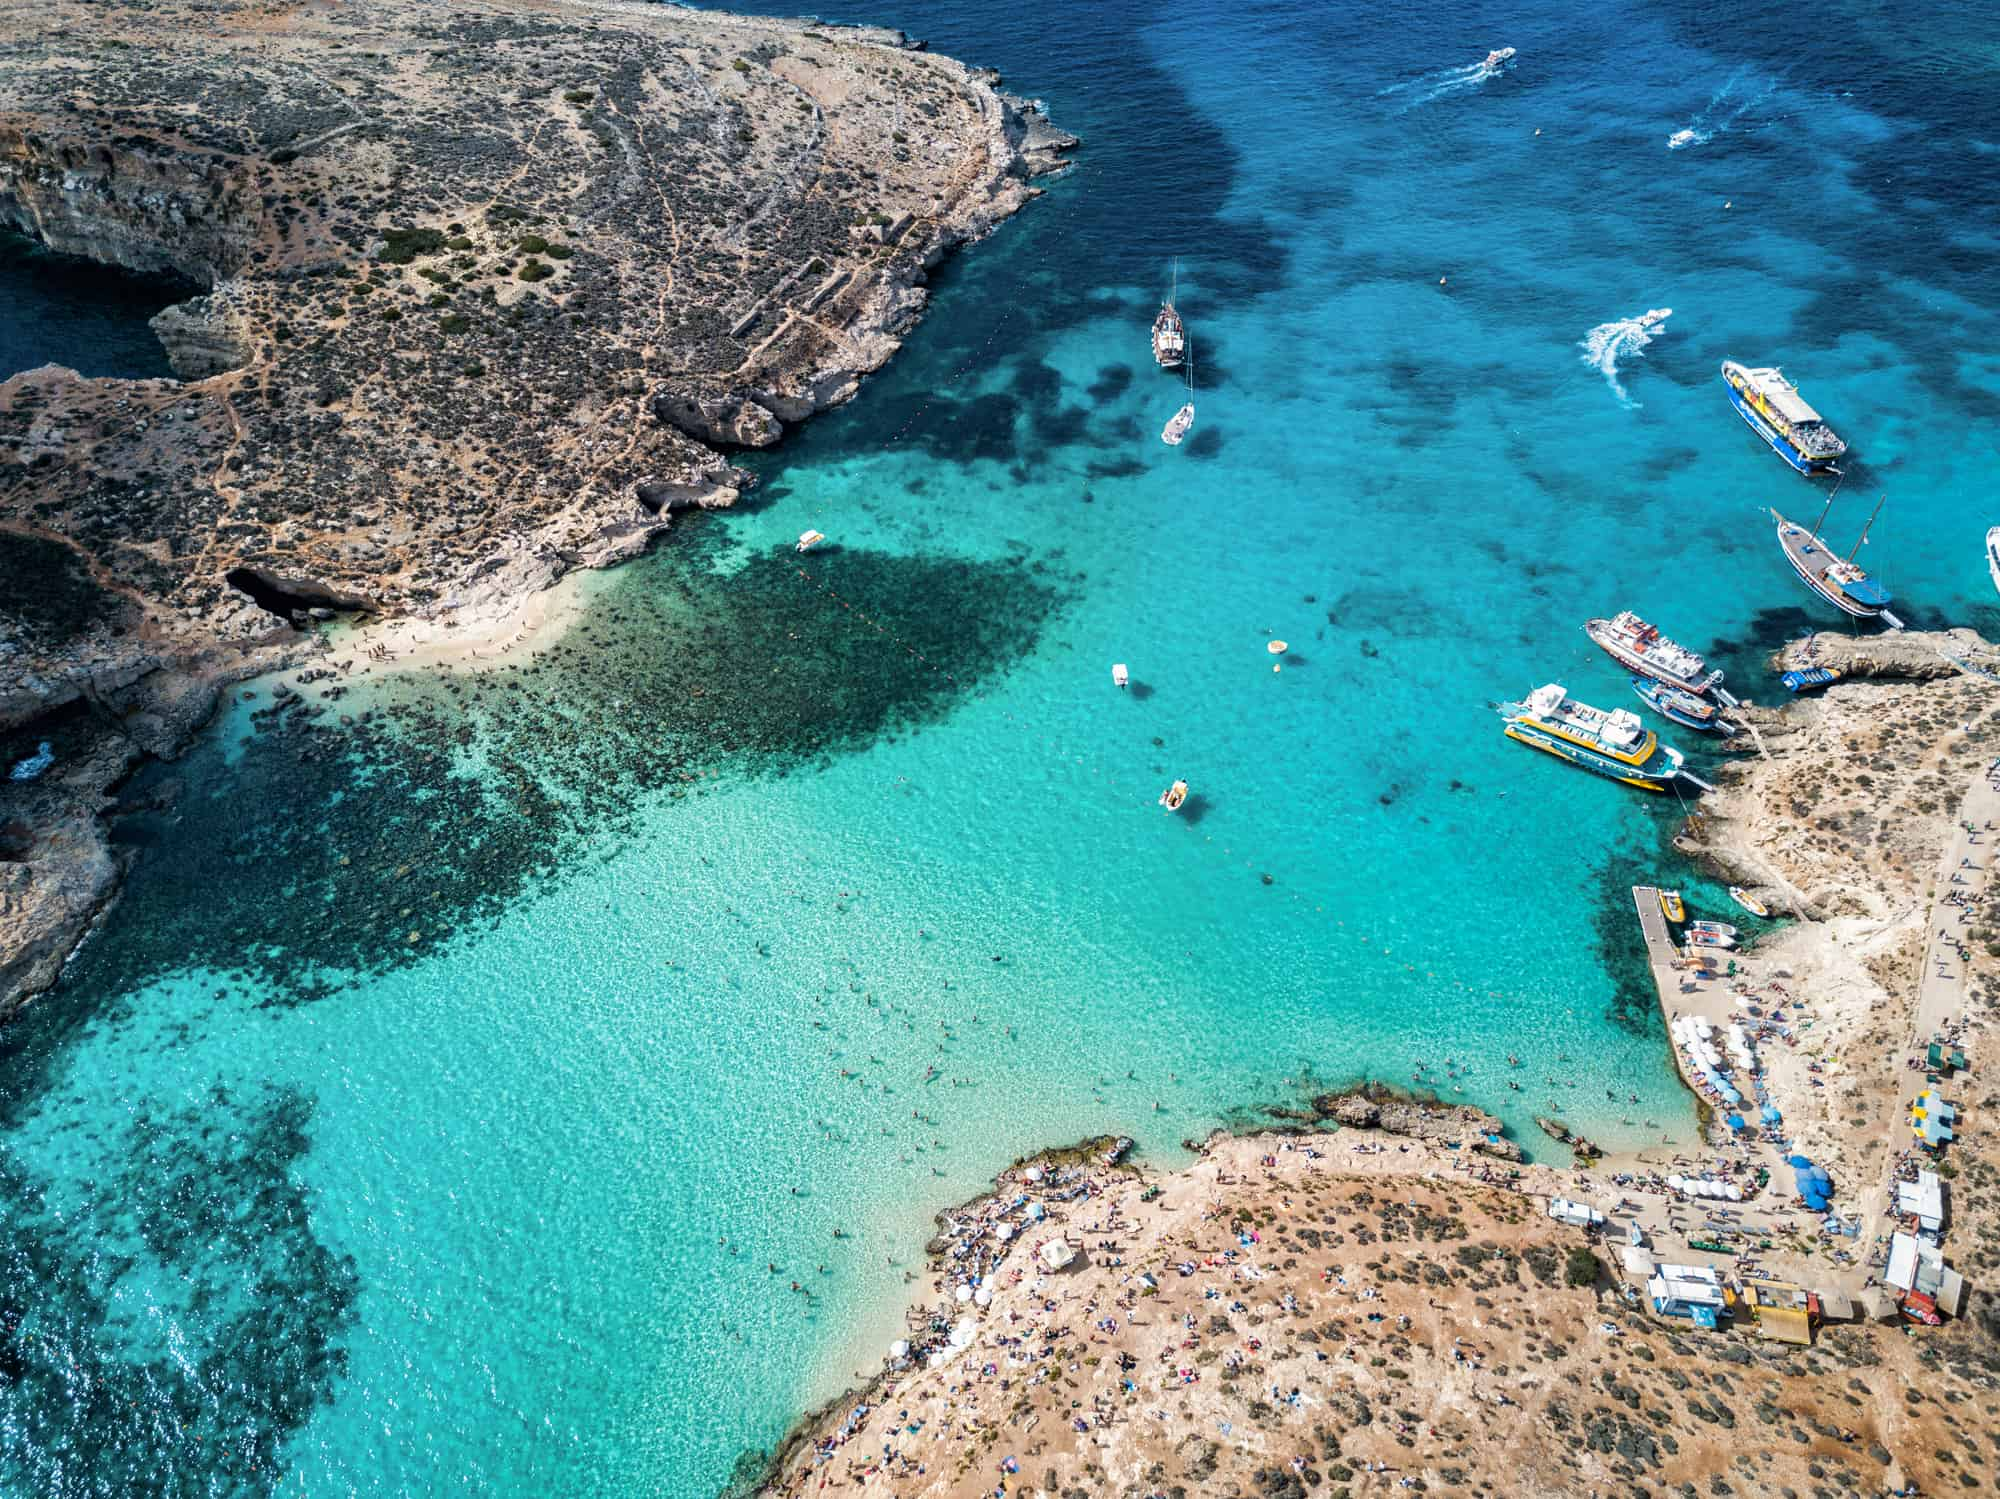 Den berømte Blå Lagune på øen Comino